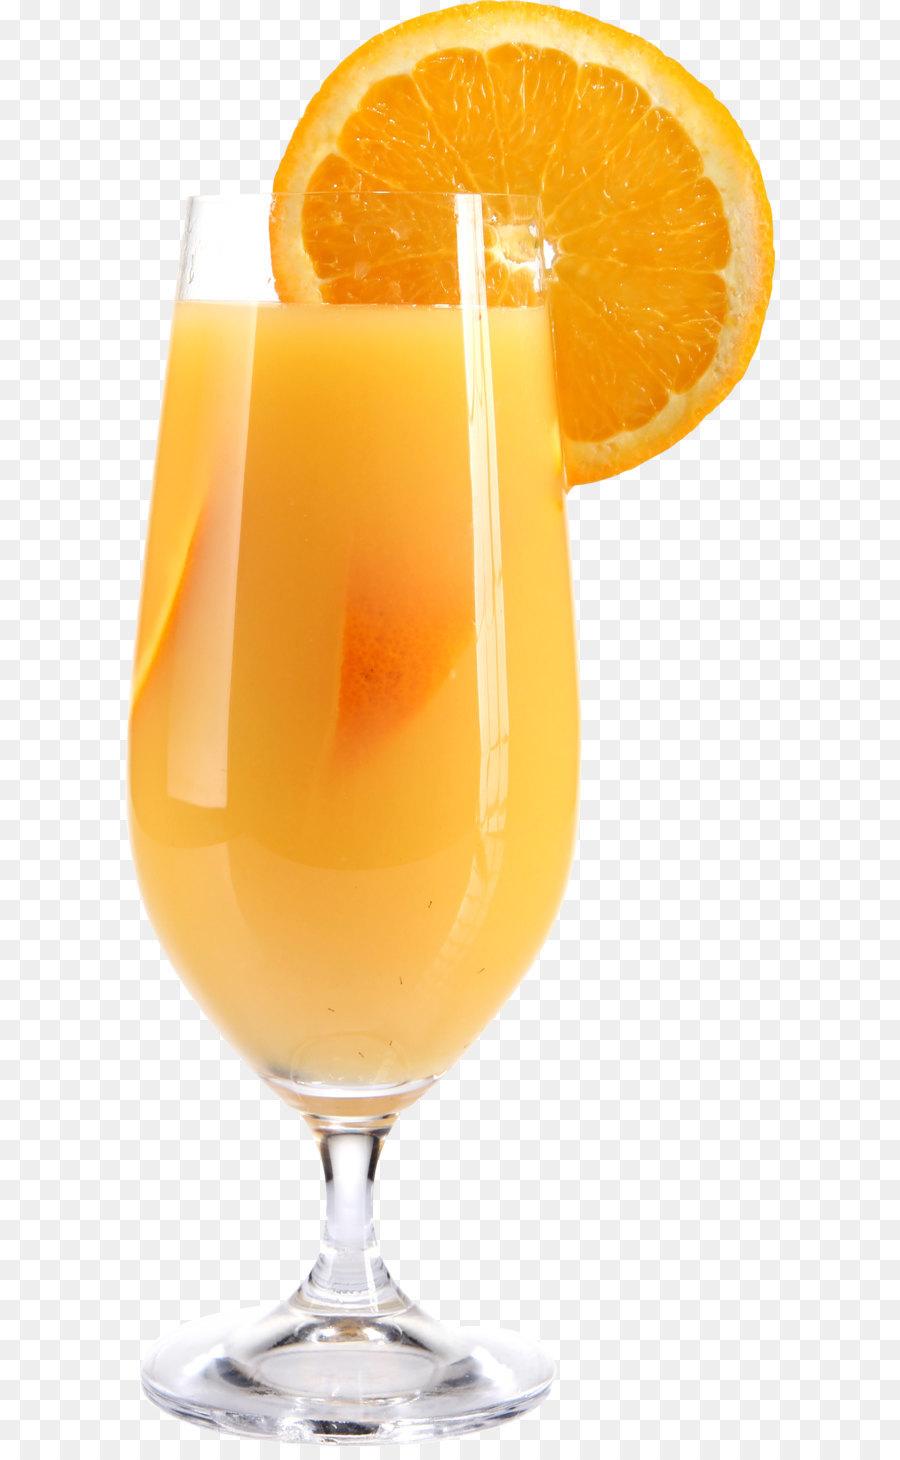 orange juice apple juice glass png image png download apple clipart images apple clipart free